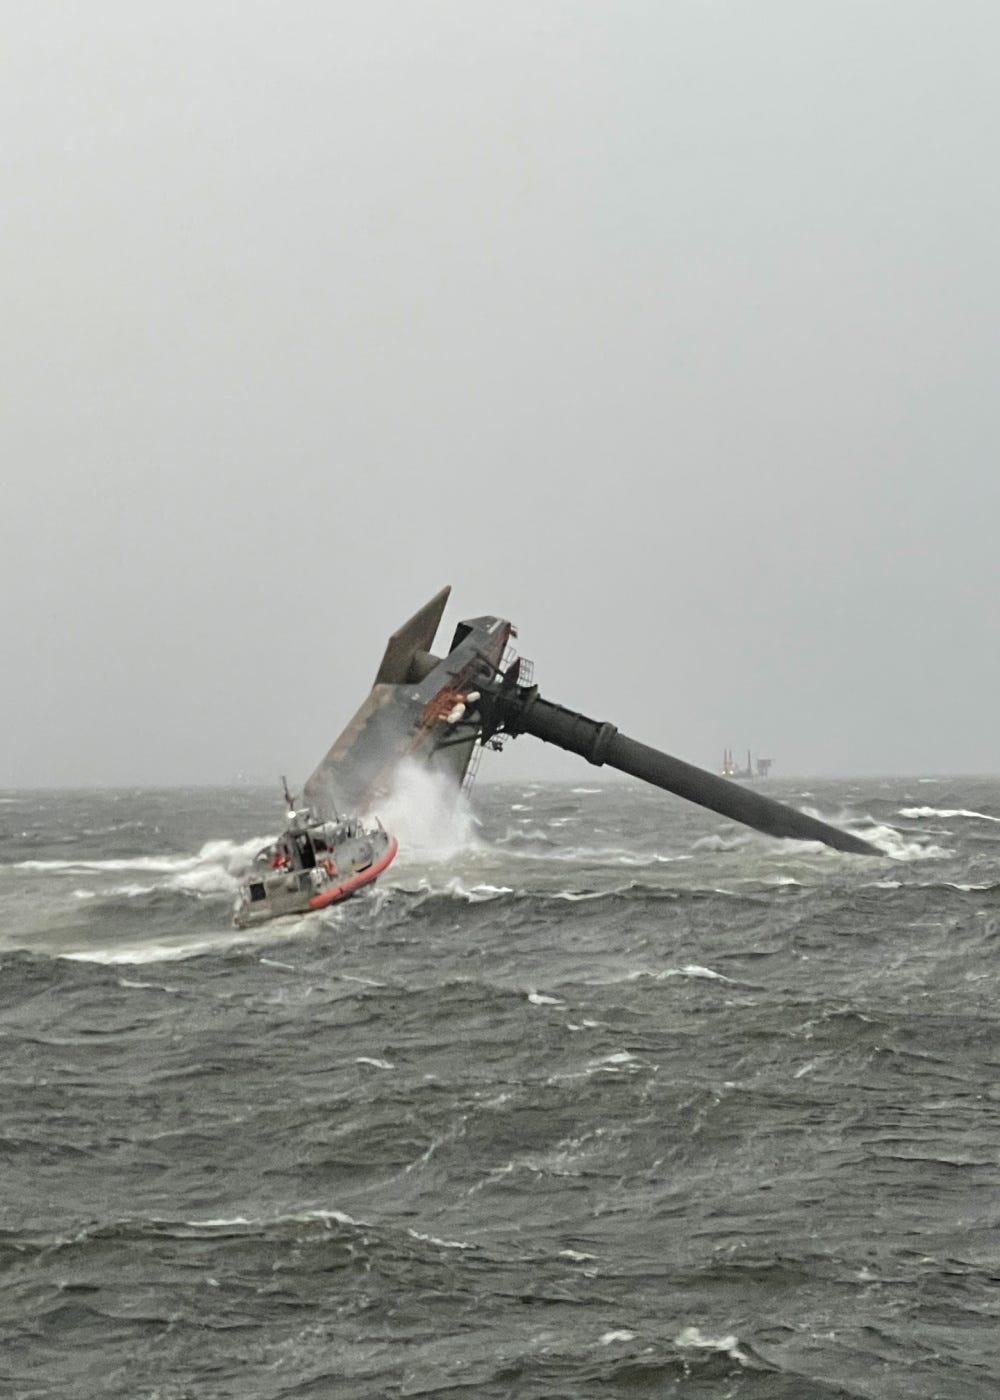 Coast Guard says commercial boat capsized off Louisiana coast